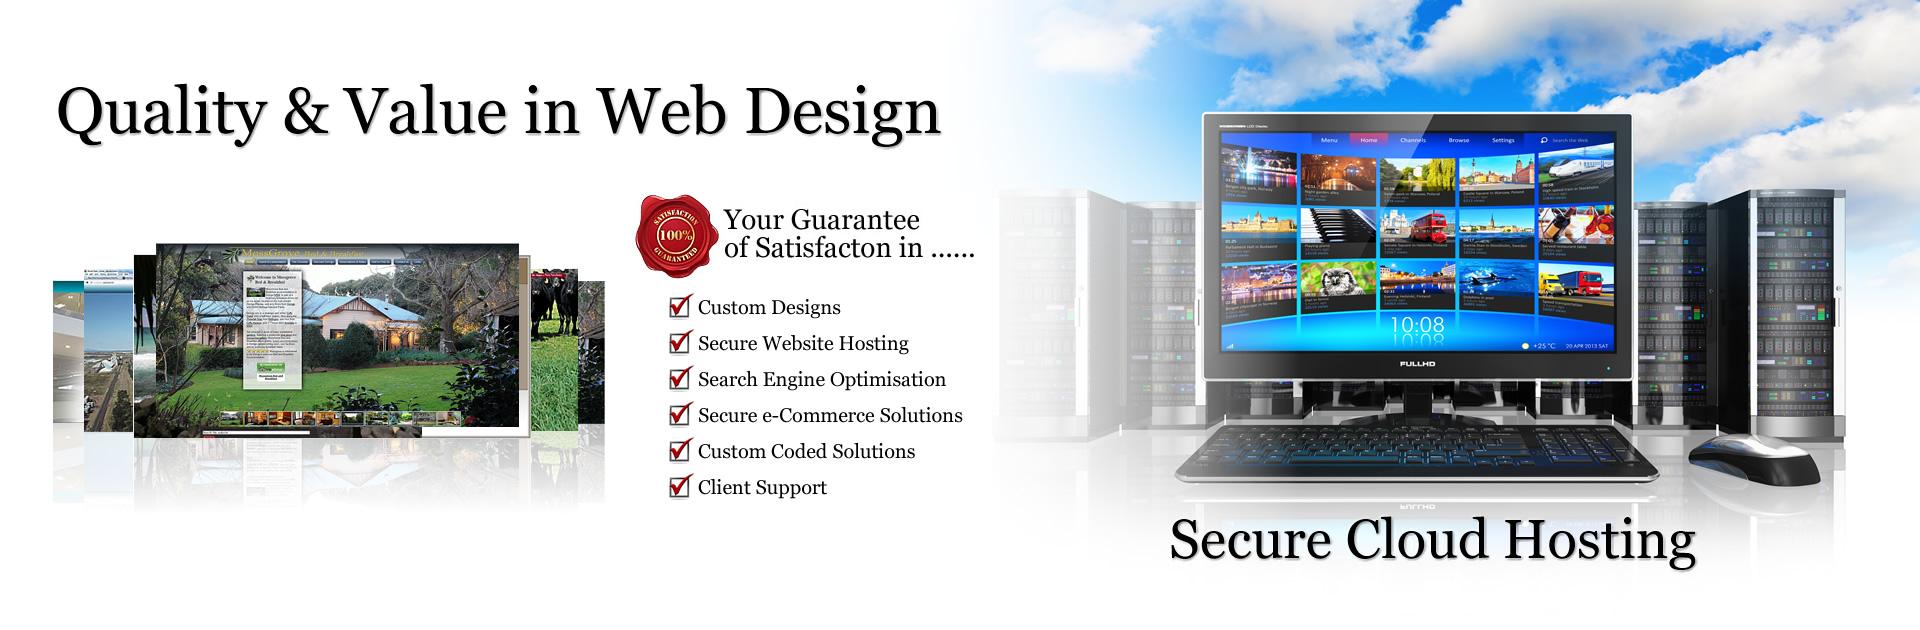 web-design-cloud-hosting